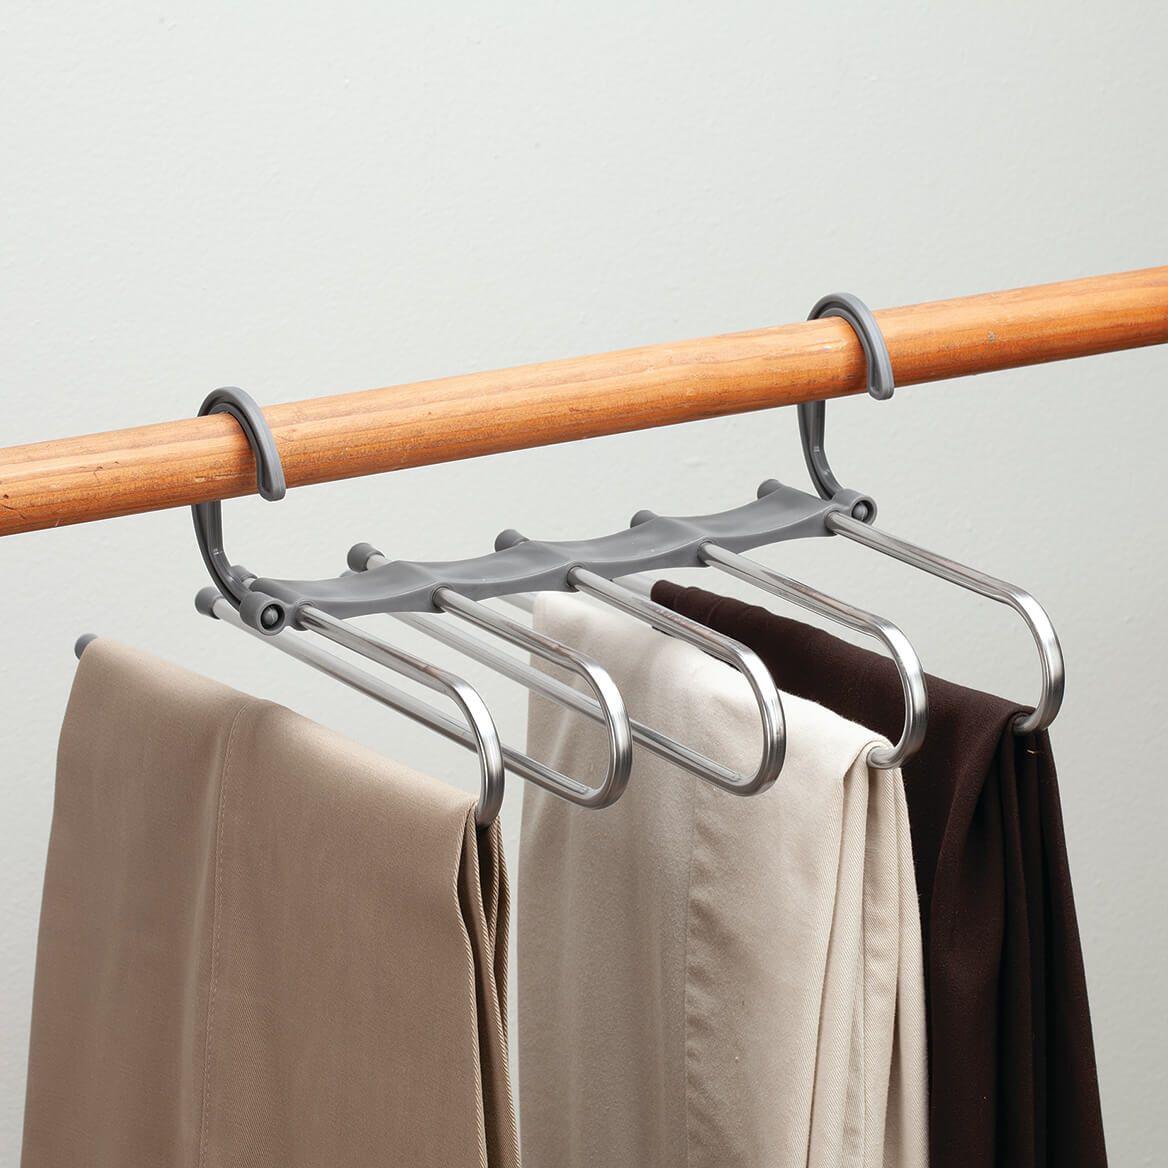 Pants Hangers Space Saving Rack-372121